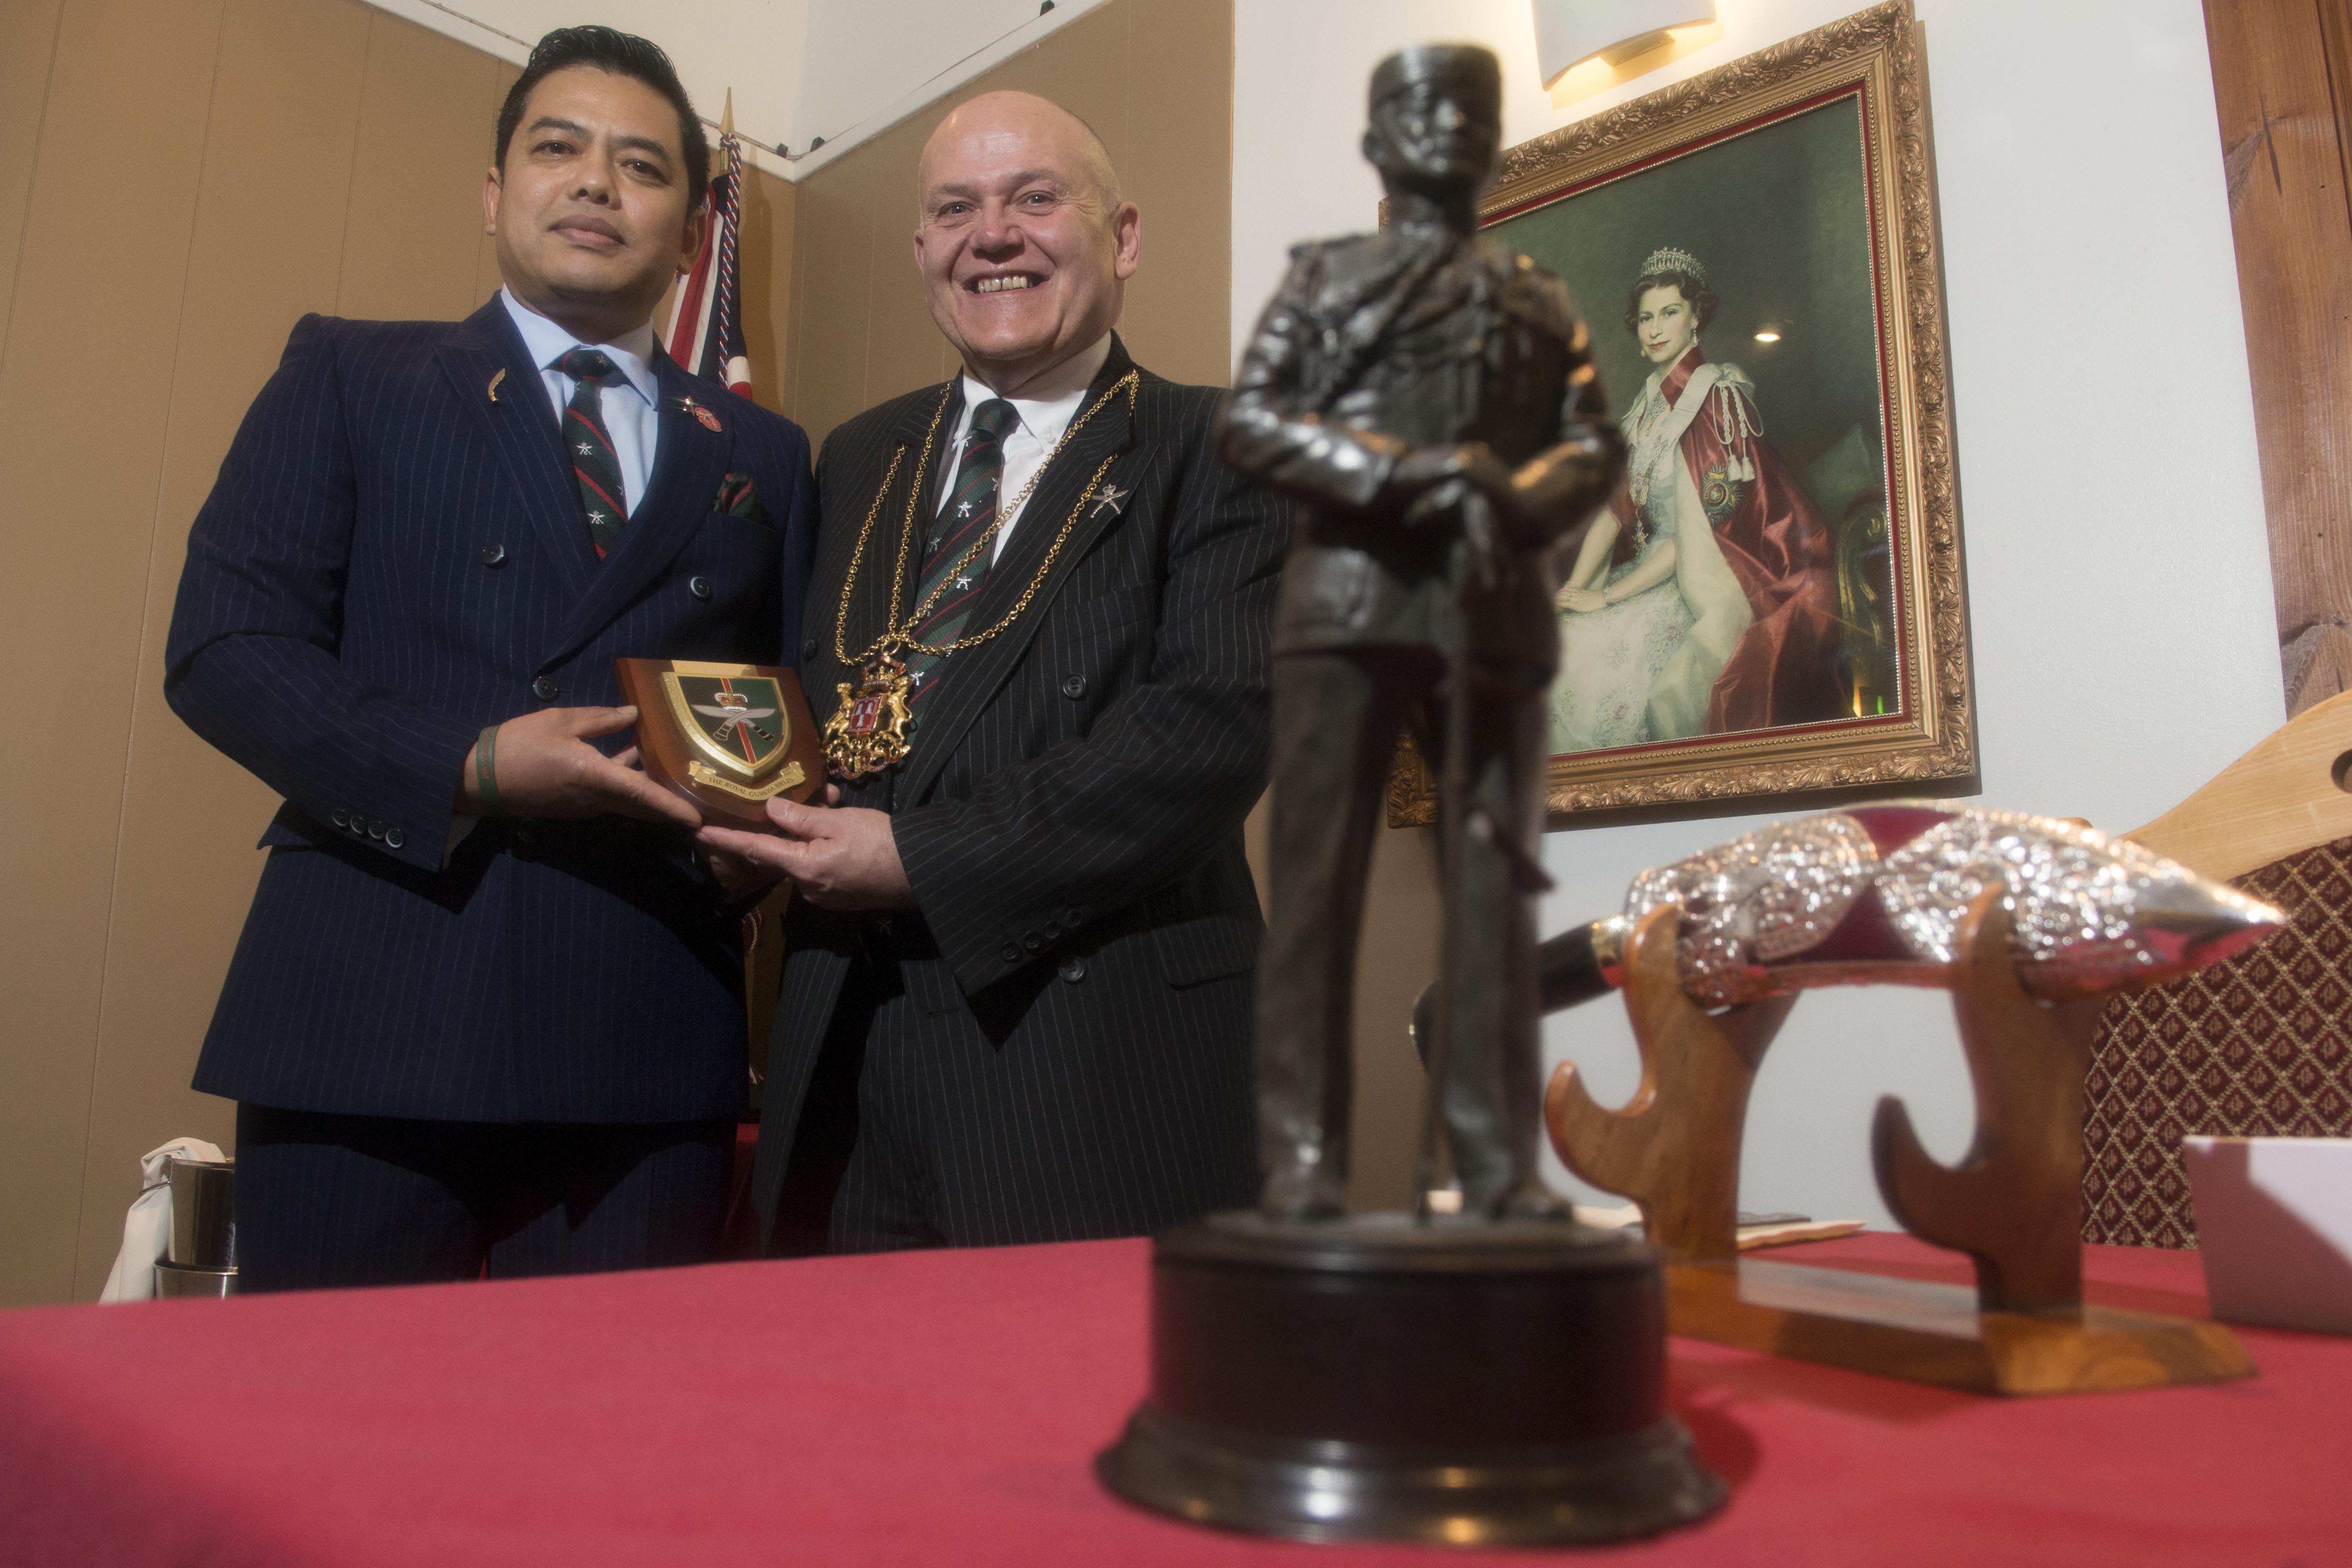 31/05/19 The Lord provost attended the North East Gurkha Regimental  Dinner and was made an honorary member of the NESGA-Norteh East Scotland Gurkha Association, President of NEGA- Honorary Lieutenant Menbadahadur Gurung,